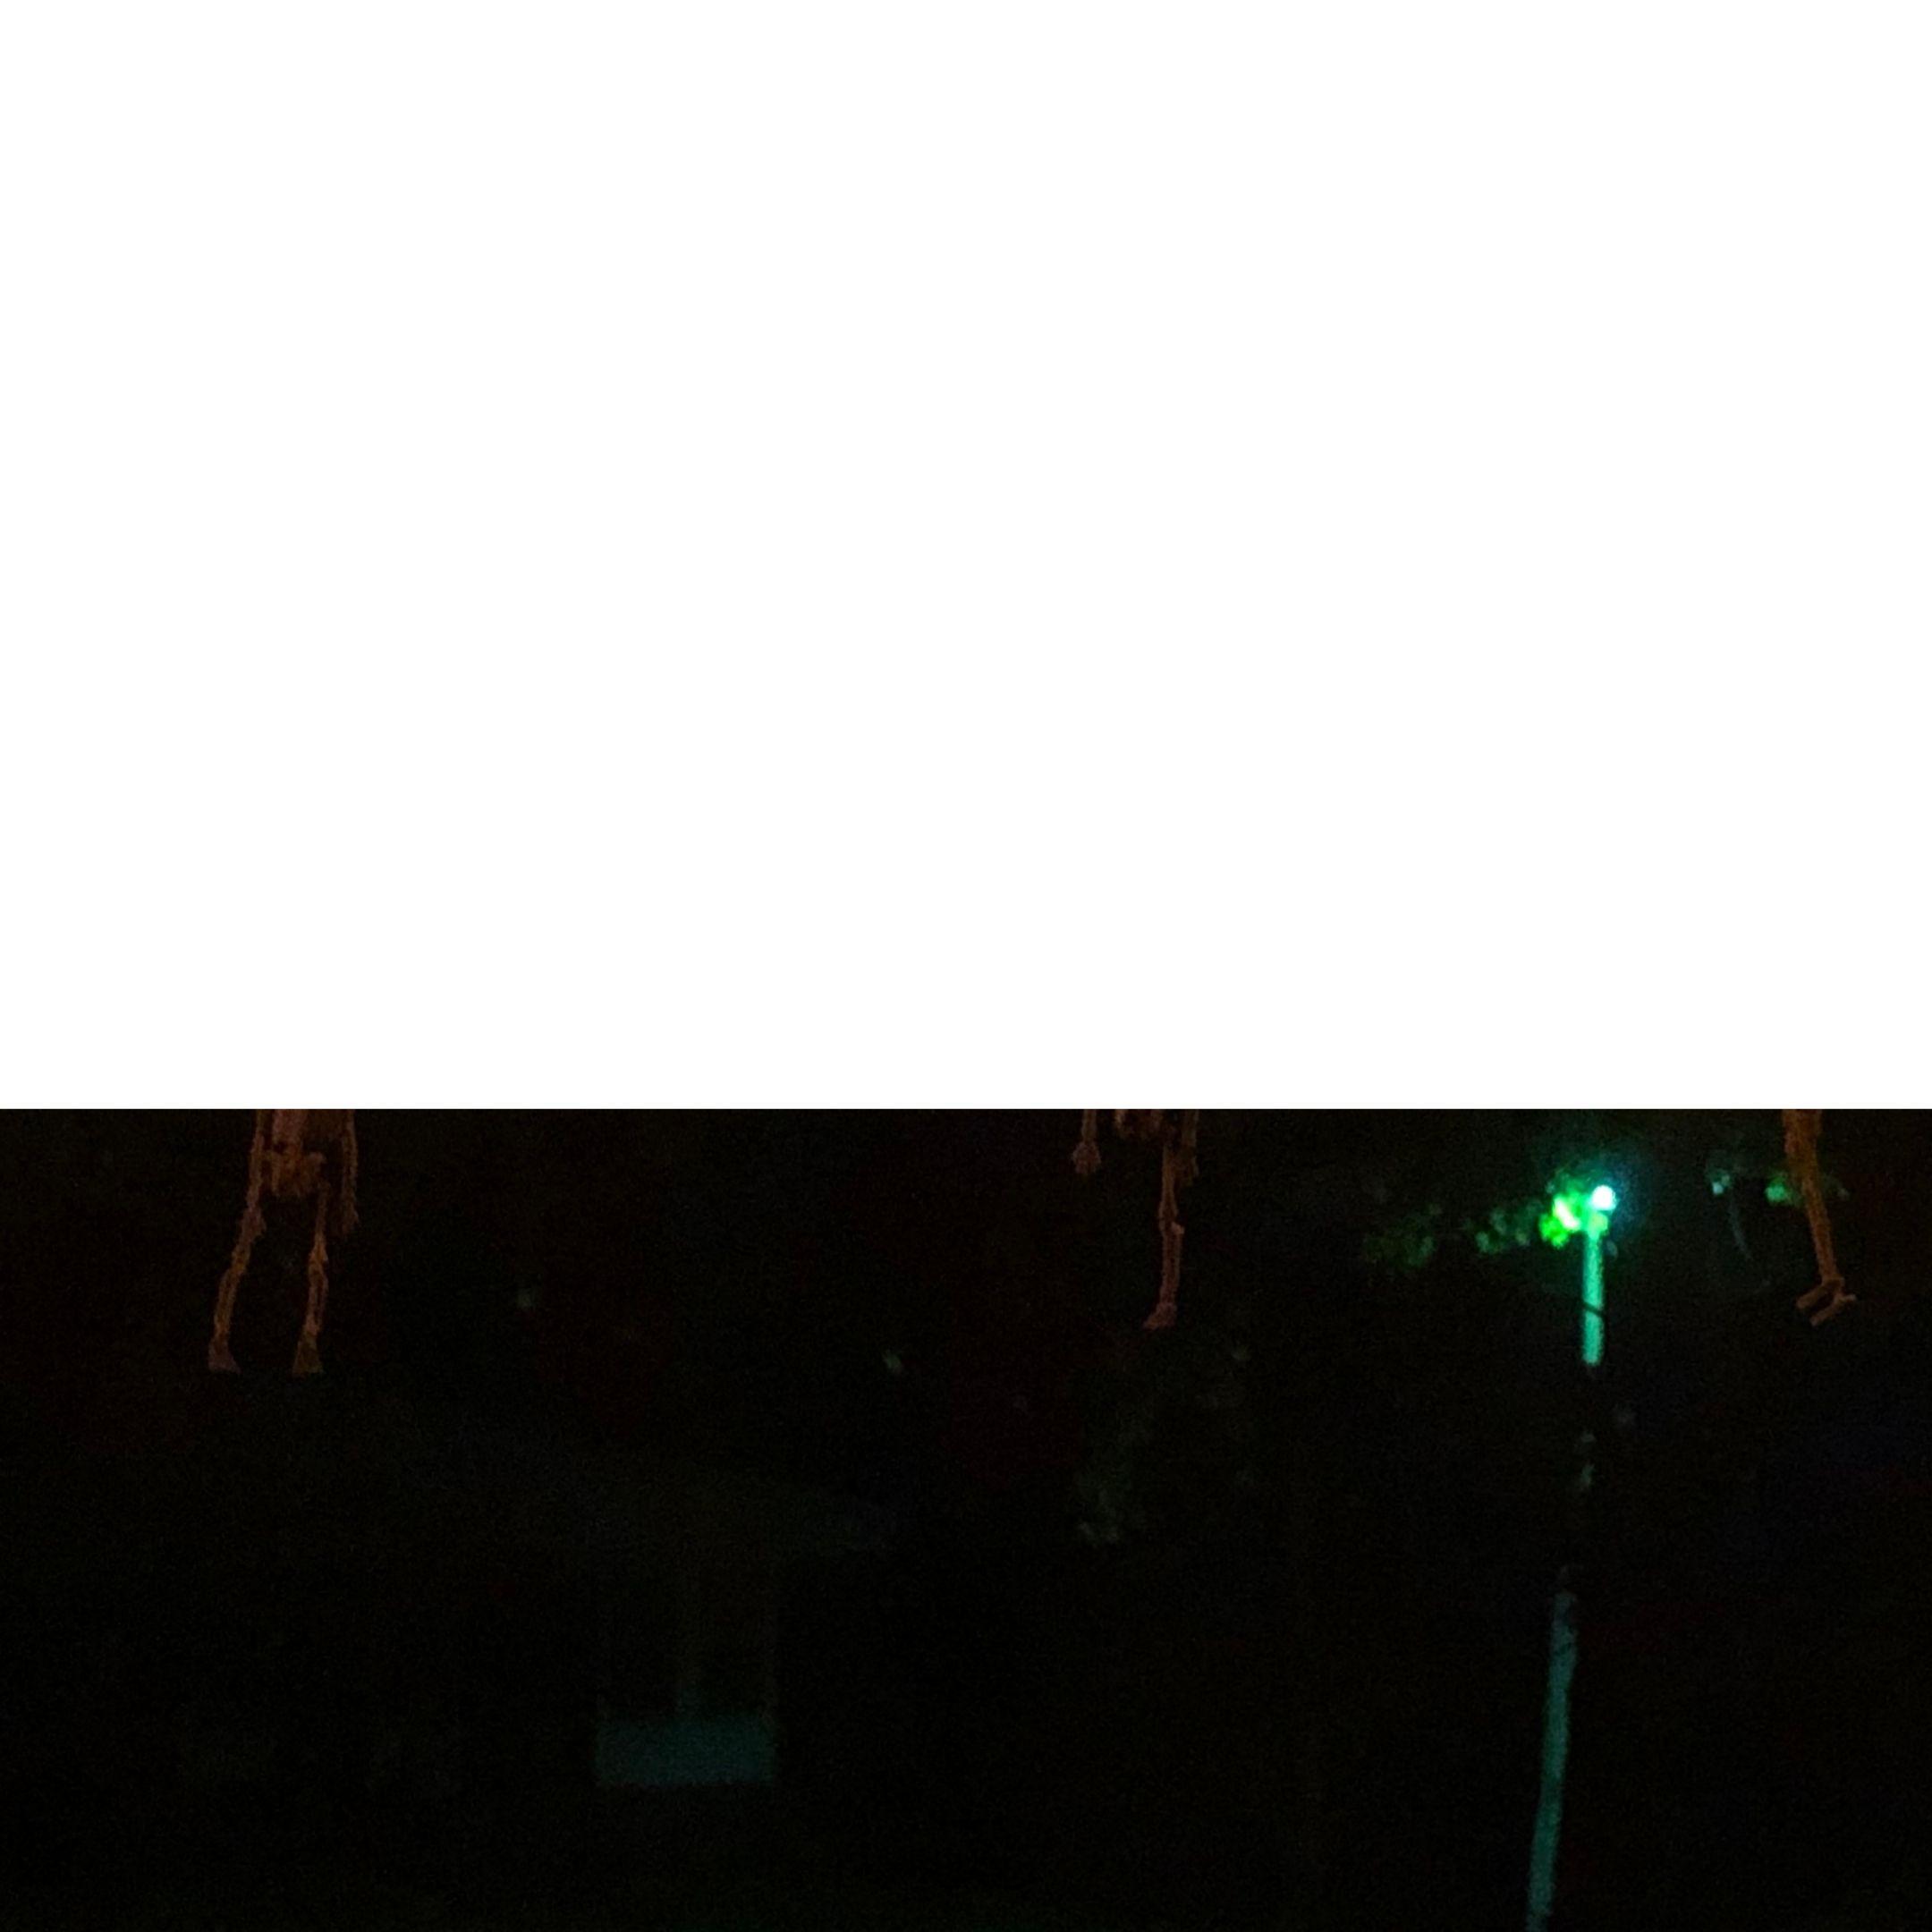 streetlight through wavy glass